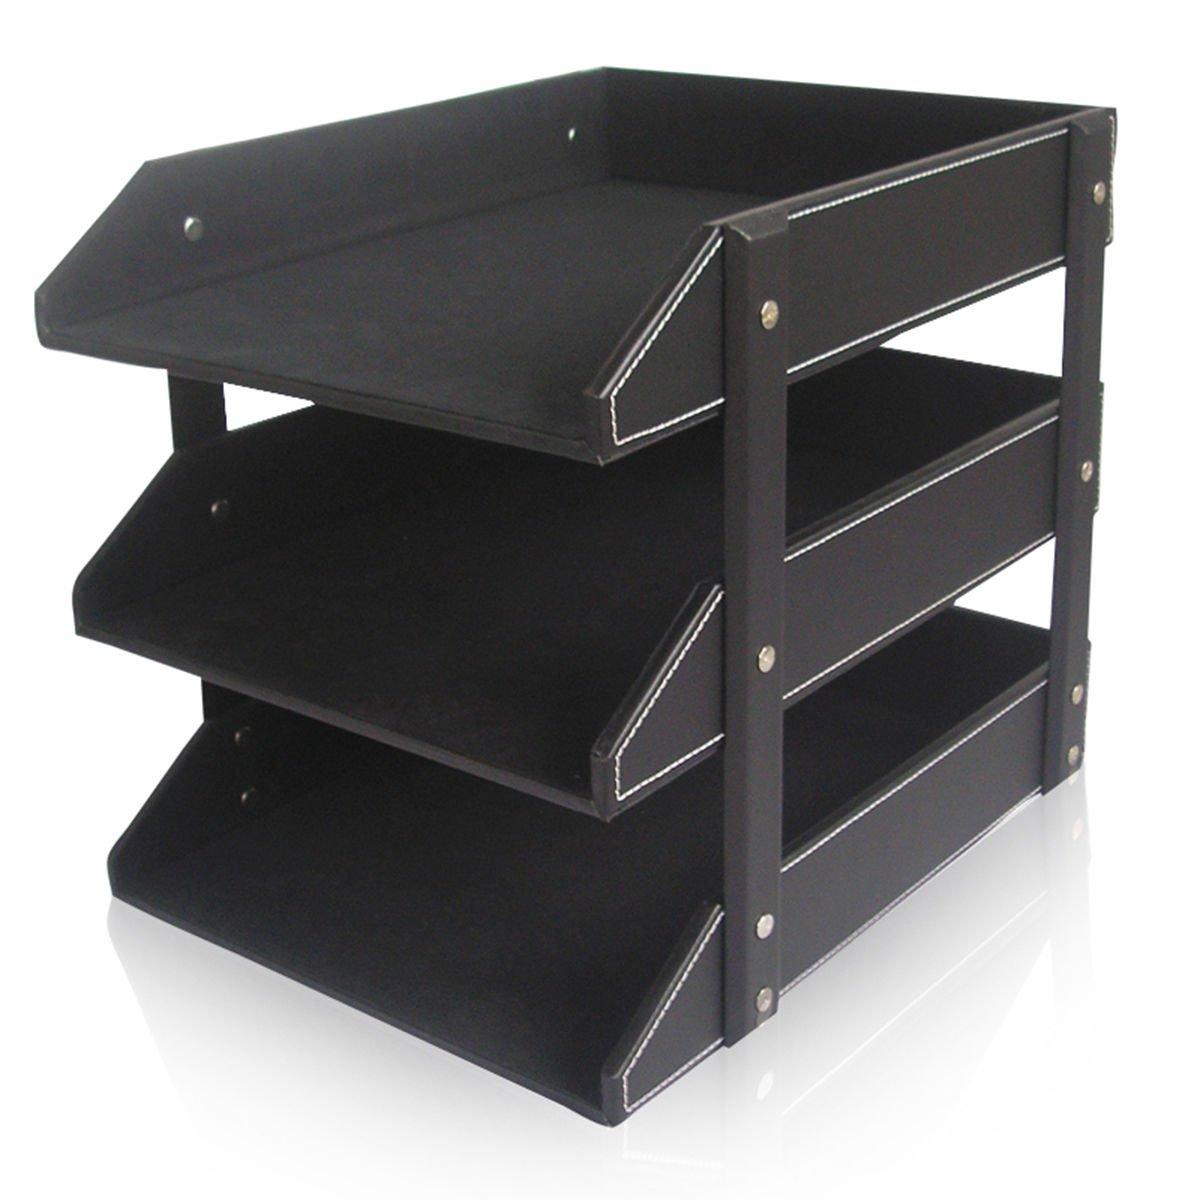 KINGFOM Letter Tray, Leather Paper Organizer Tray, Wooden Desk File Holder, Desktop File, Stackable Magazine Holder, Mail Sorter, Great for Home or Office - 3 Level Black